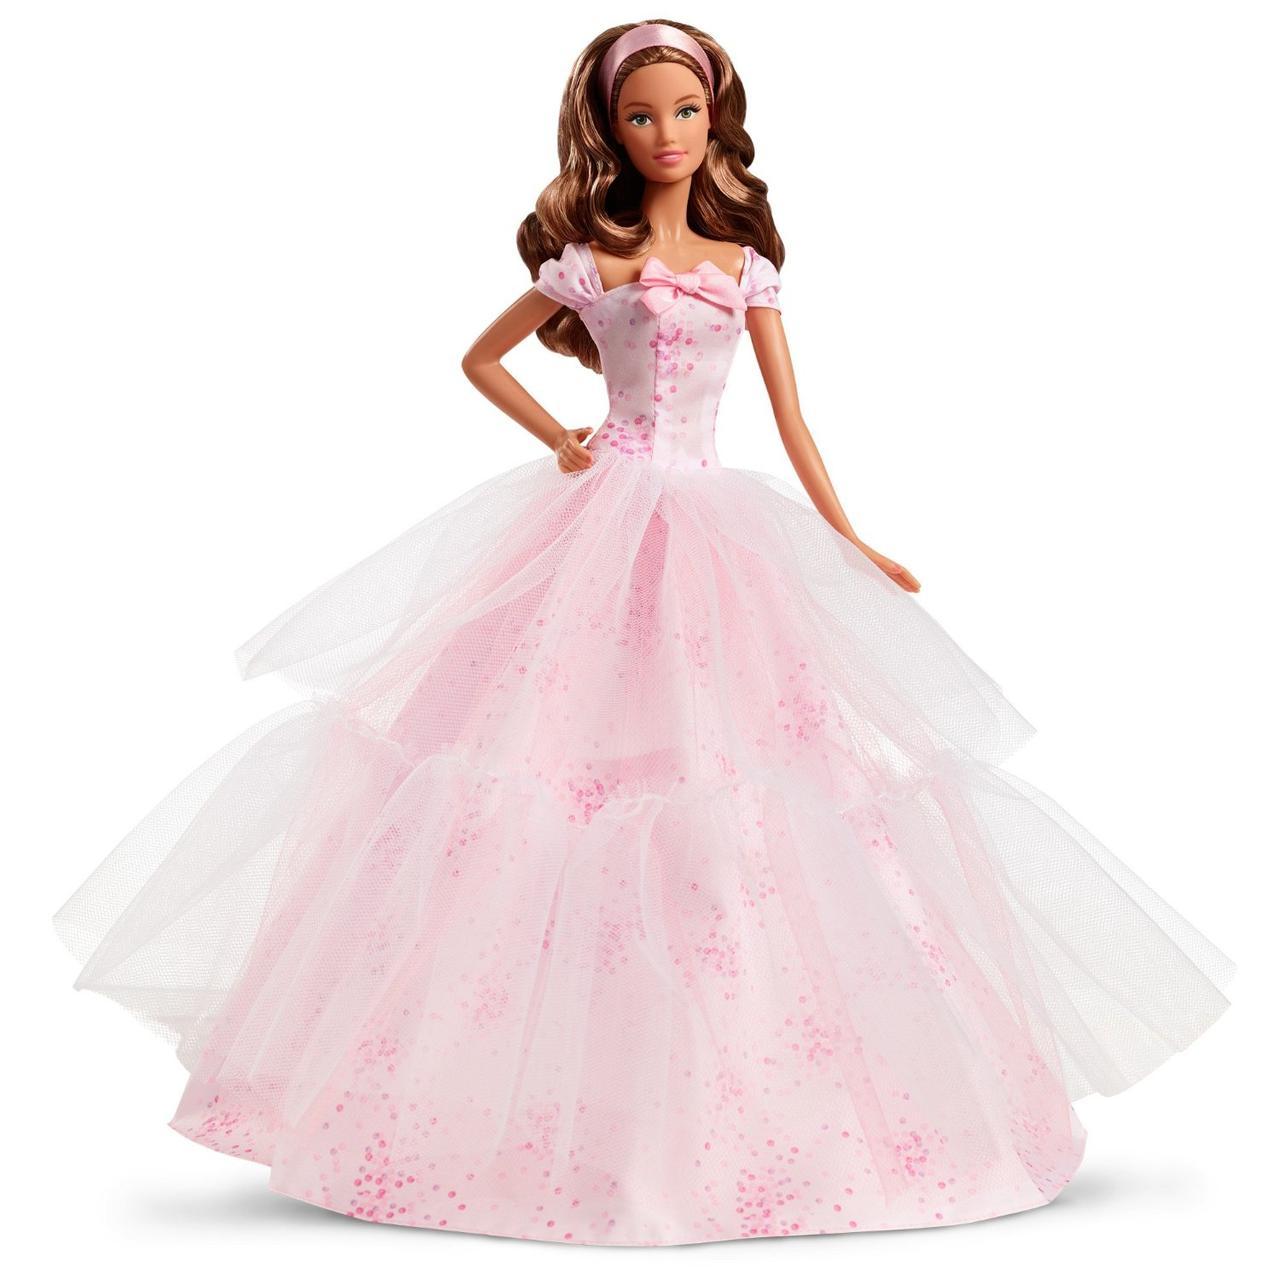 Кукла Барби коллекционная шатенка Особый День рождения Barbie Birthday Wishes 2016 Barbie Doll Light Brunette